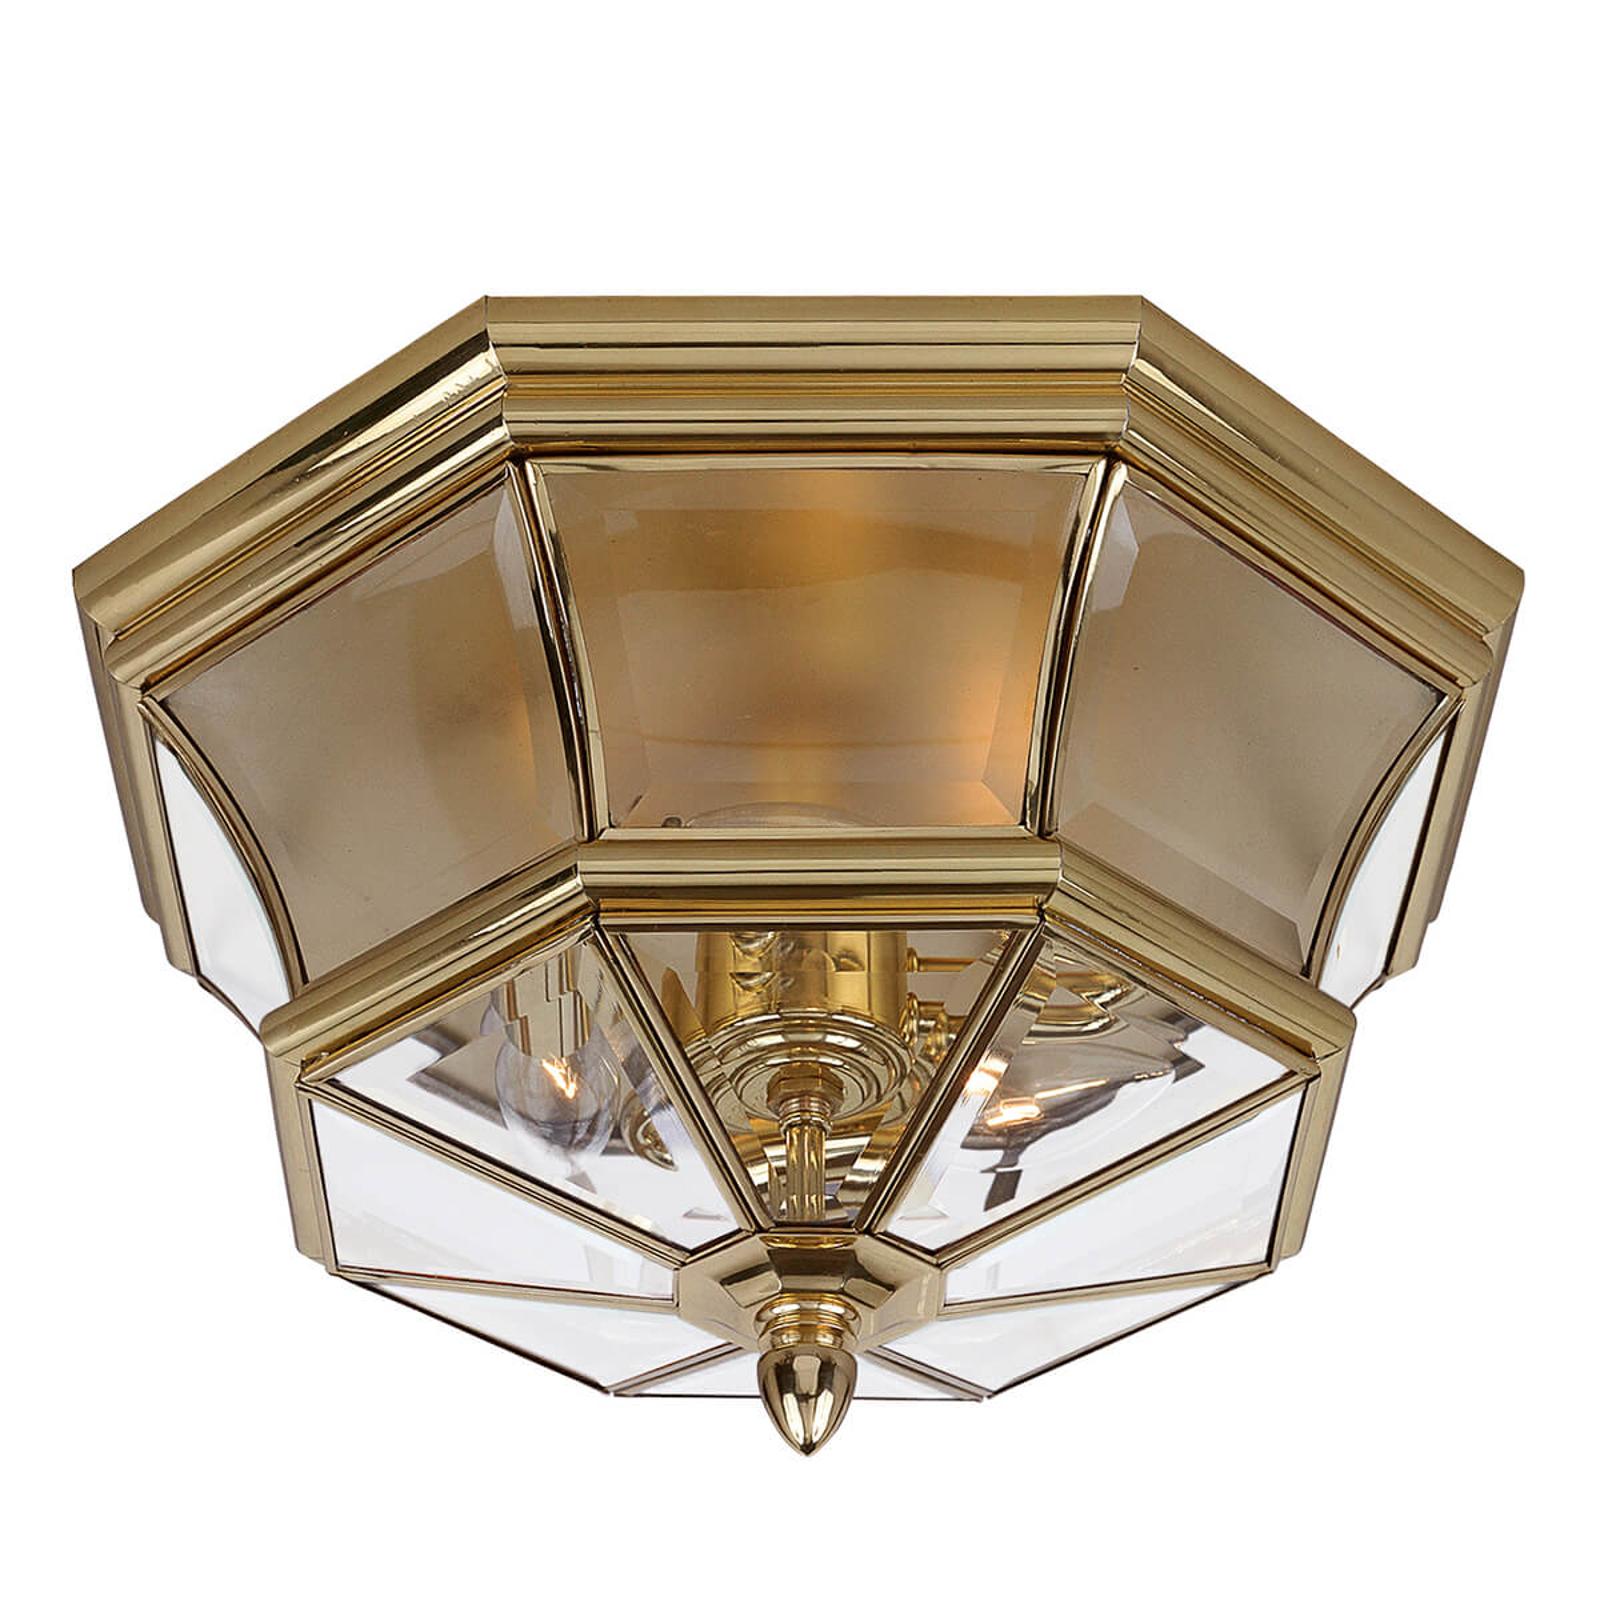 Spatwaterbeschermde plafondlamp Newbury